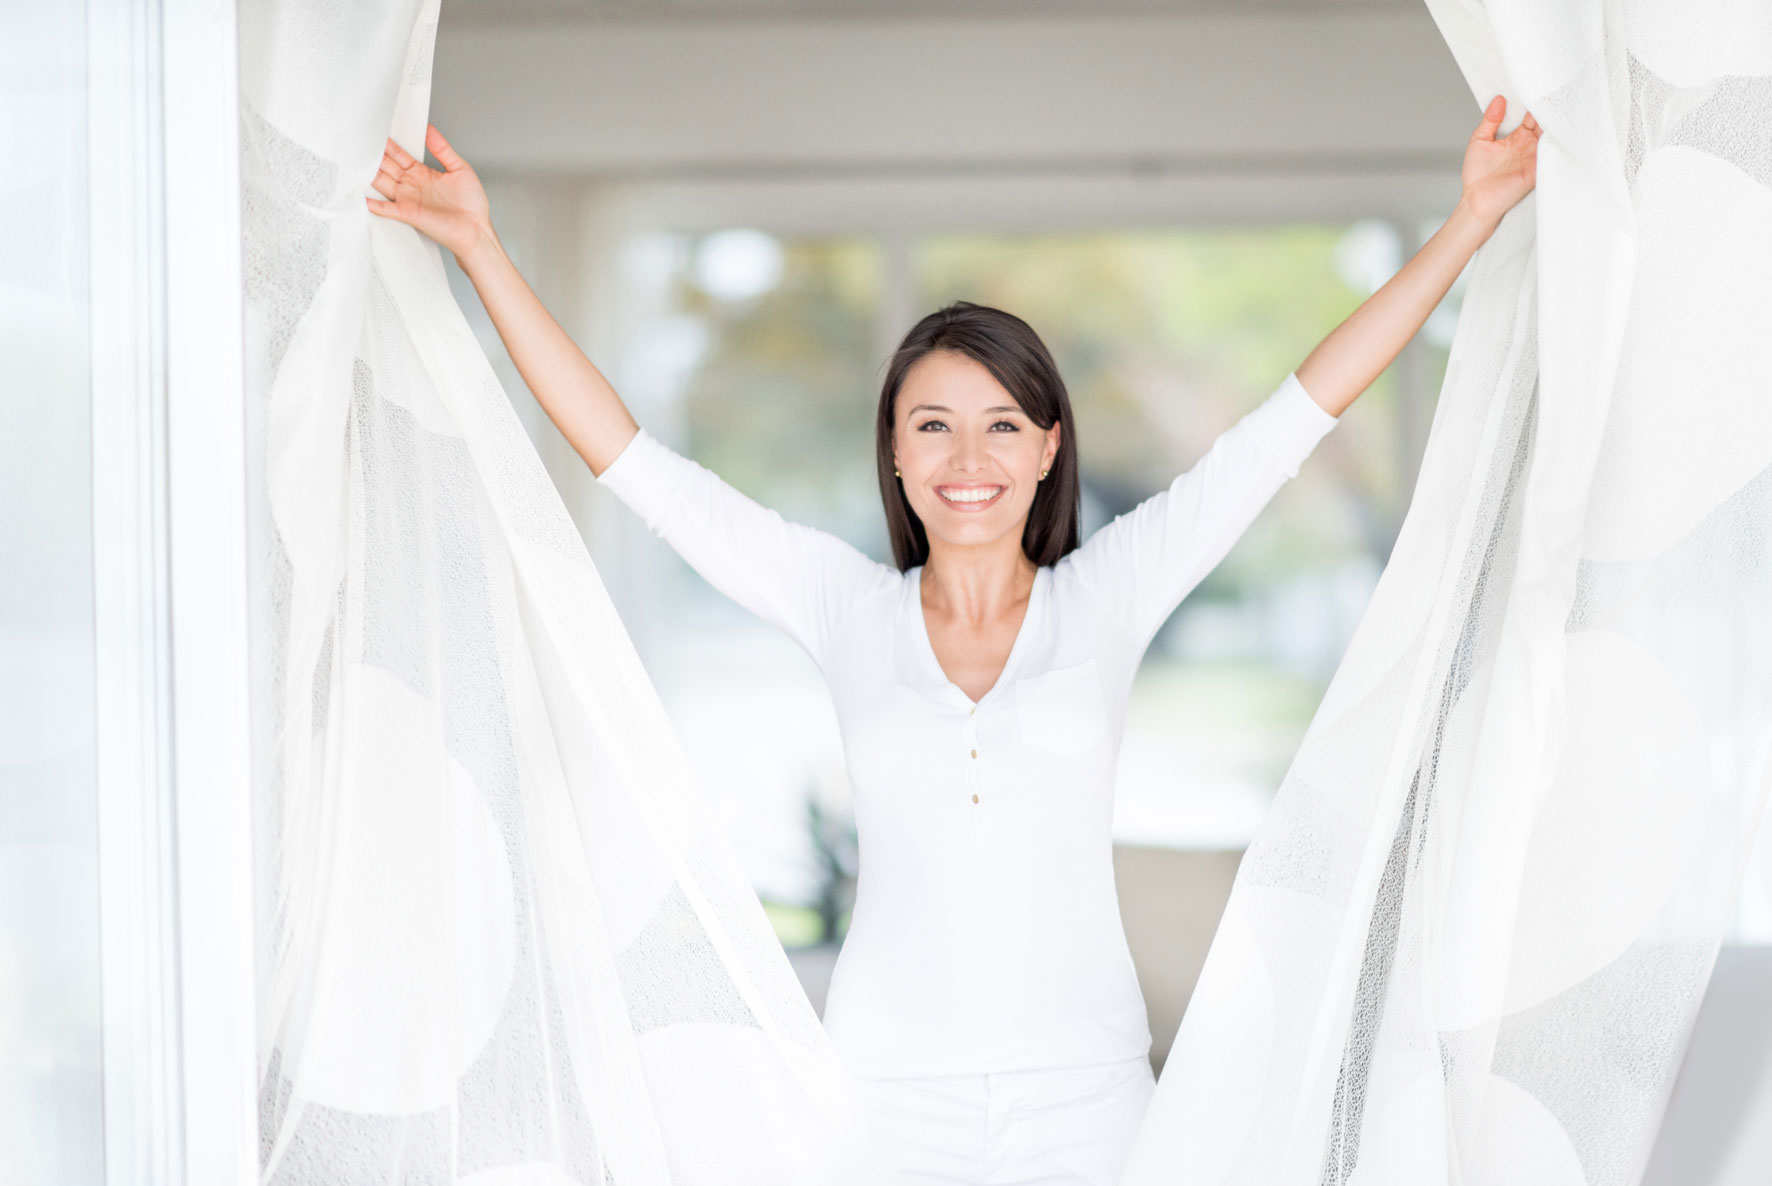 Super Bianco Tende lavatrice